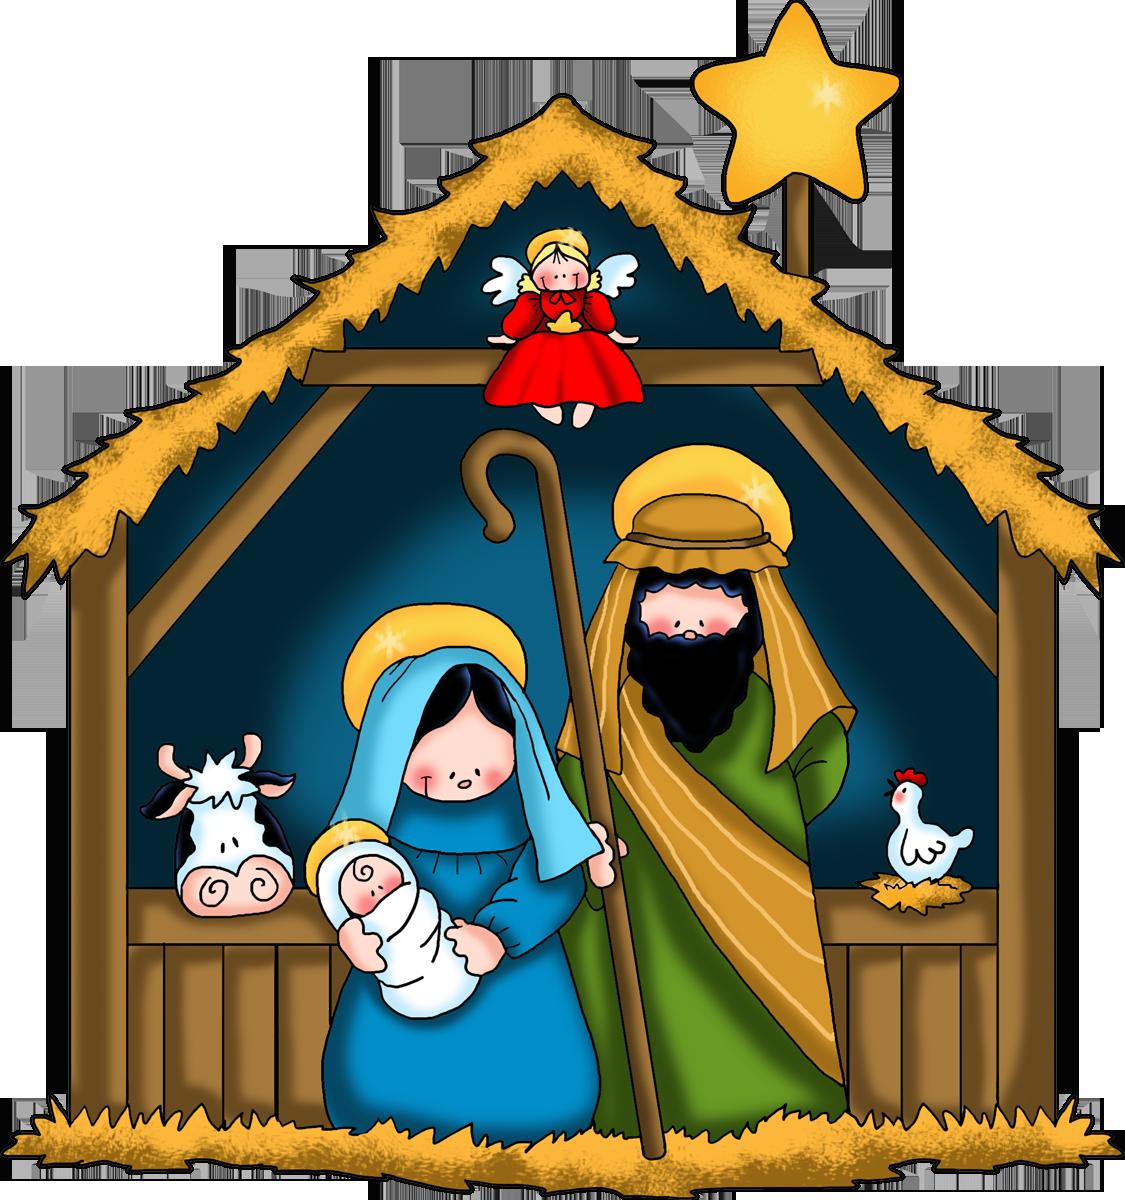 Nativity Scene Clipart New Calendar Temp-Nativity Scene Clipart New Calendar Template Site-11